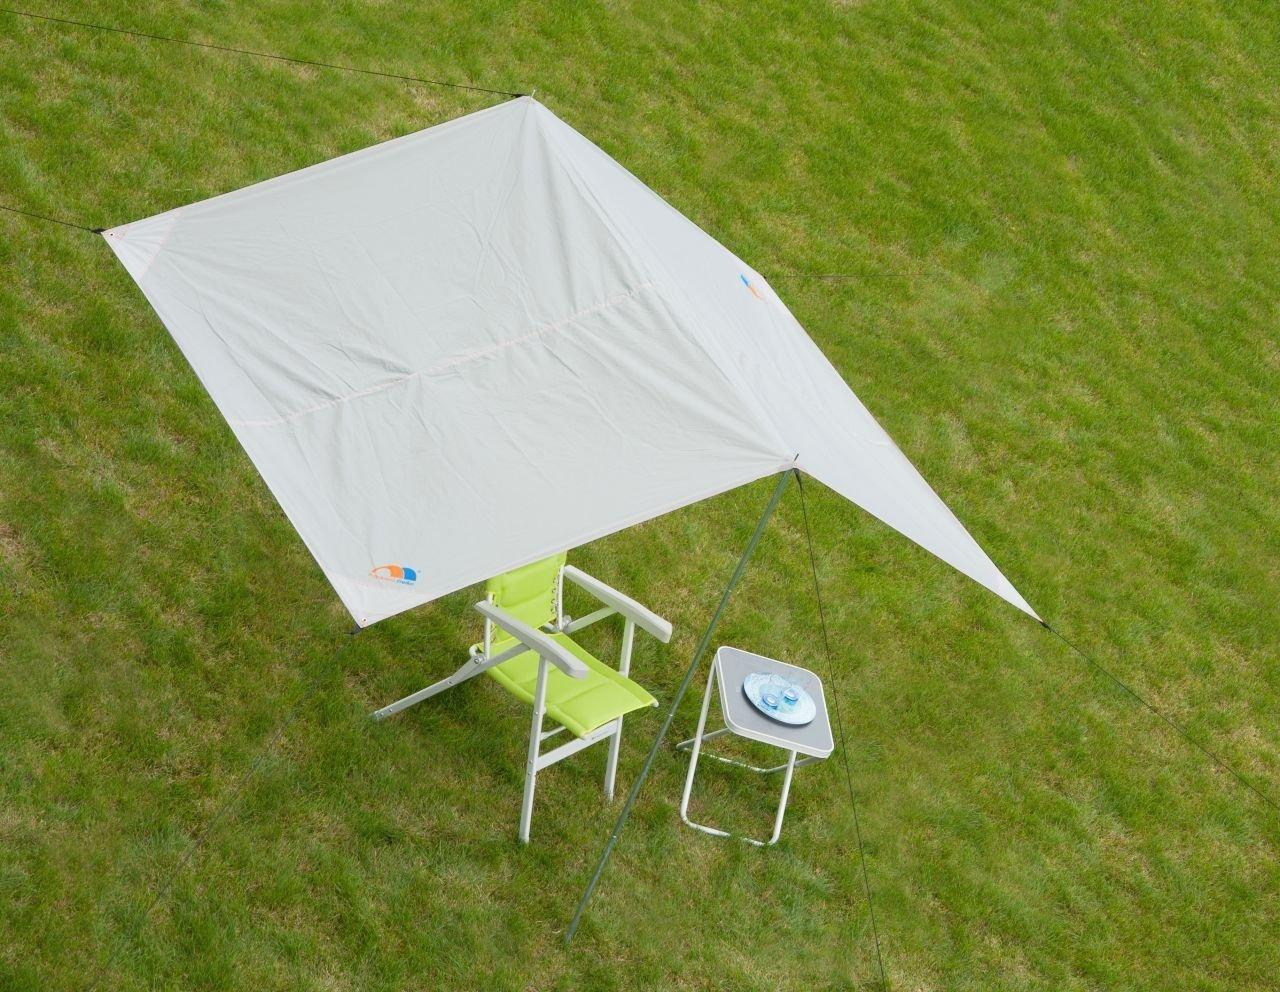 Frankana TARP Basic Sun Shelter Sail & pali camping caravan grigio chiaro 4 x 6 m